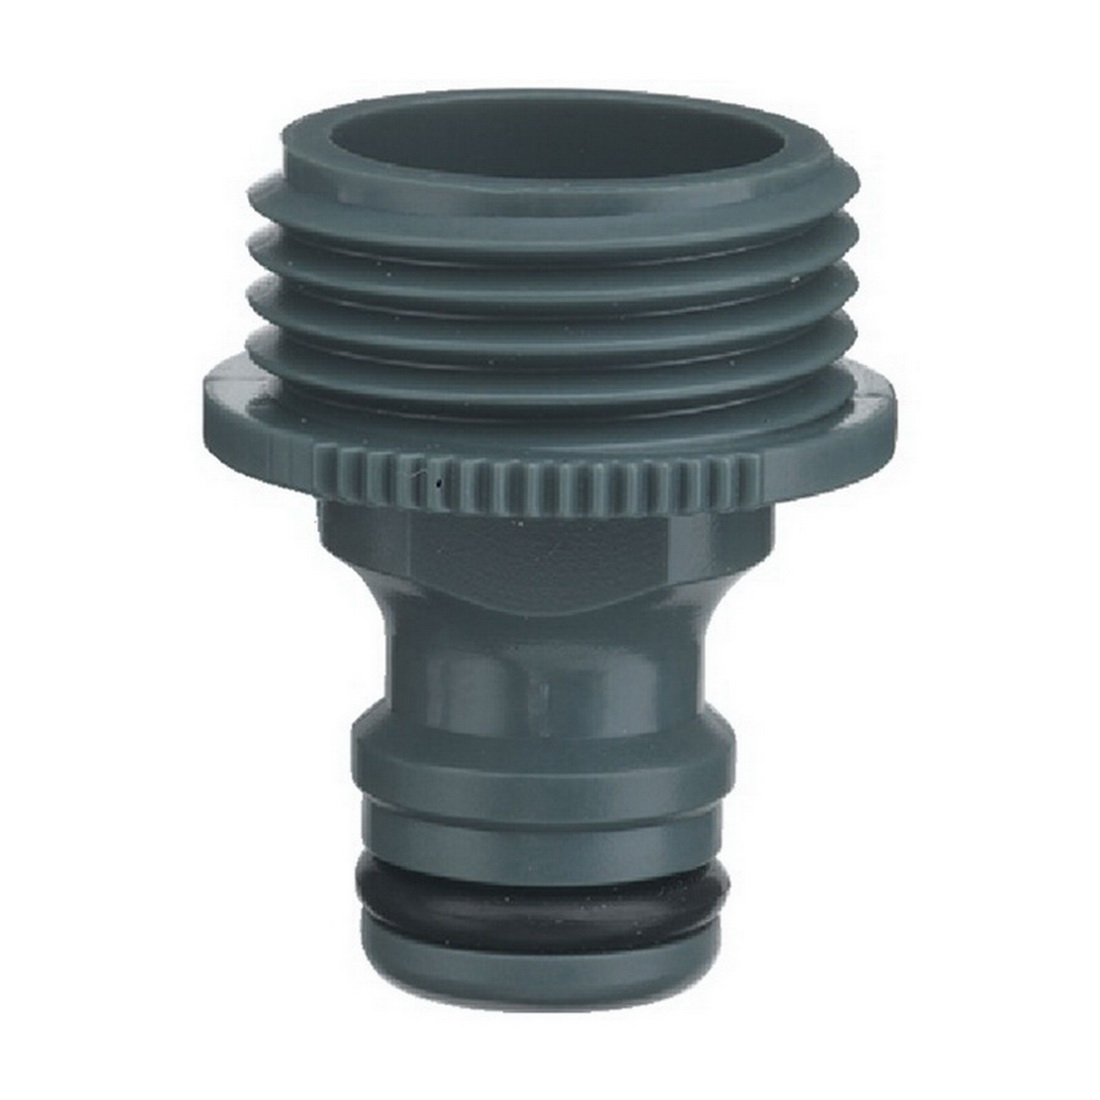 Plastic Sprinkler Adaptor 12mm Connection x 20mm